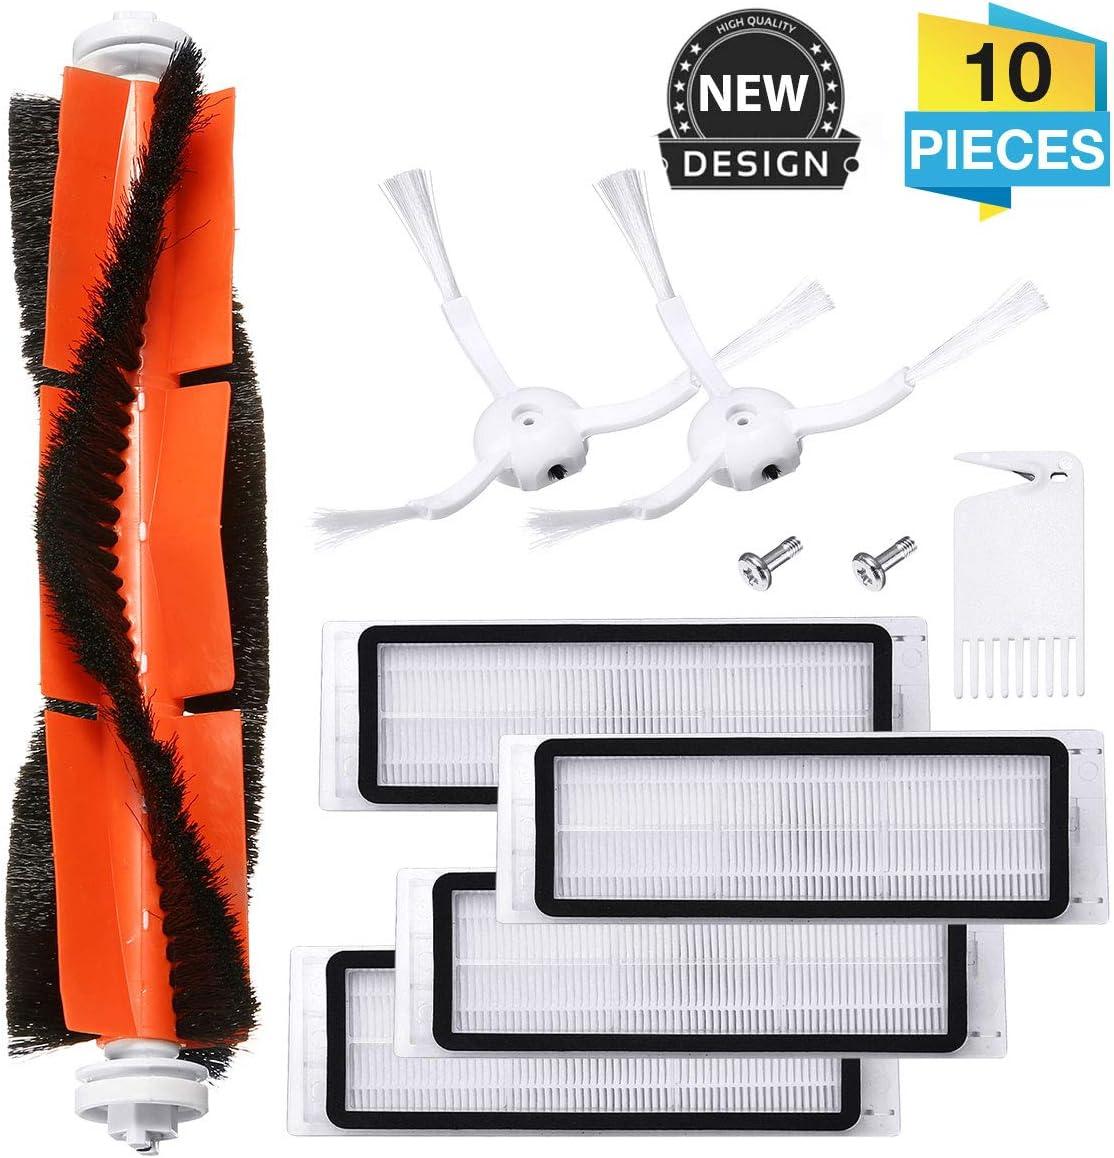 Charminer Accesorios Compatibles para Aspiradora Xiaomi Vacuum 1/2 Robot Recambio de Roborock s50, 1 Cepillo Central + 2 Cepillos Laterales + 1 Auxiliar de Limpieza + 4 Filtros HEPA